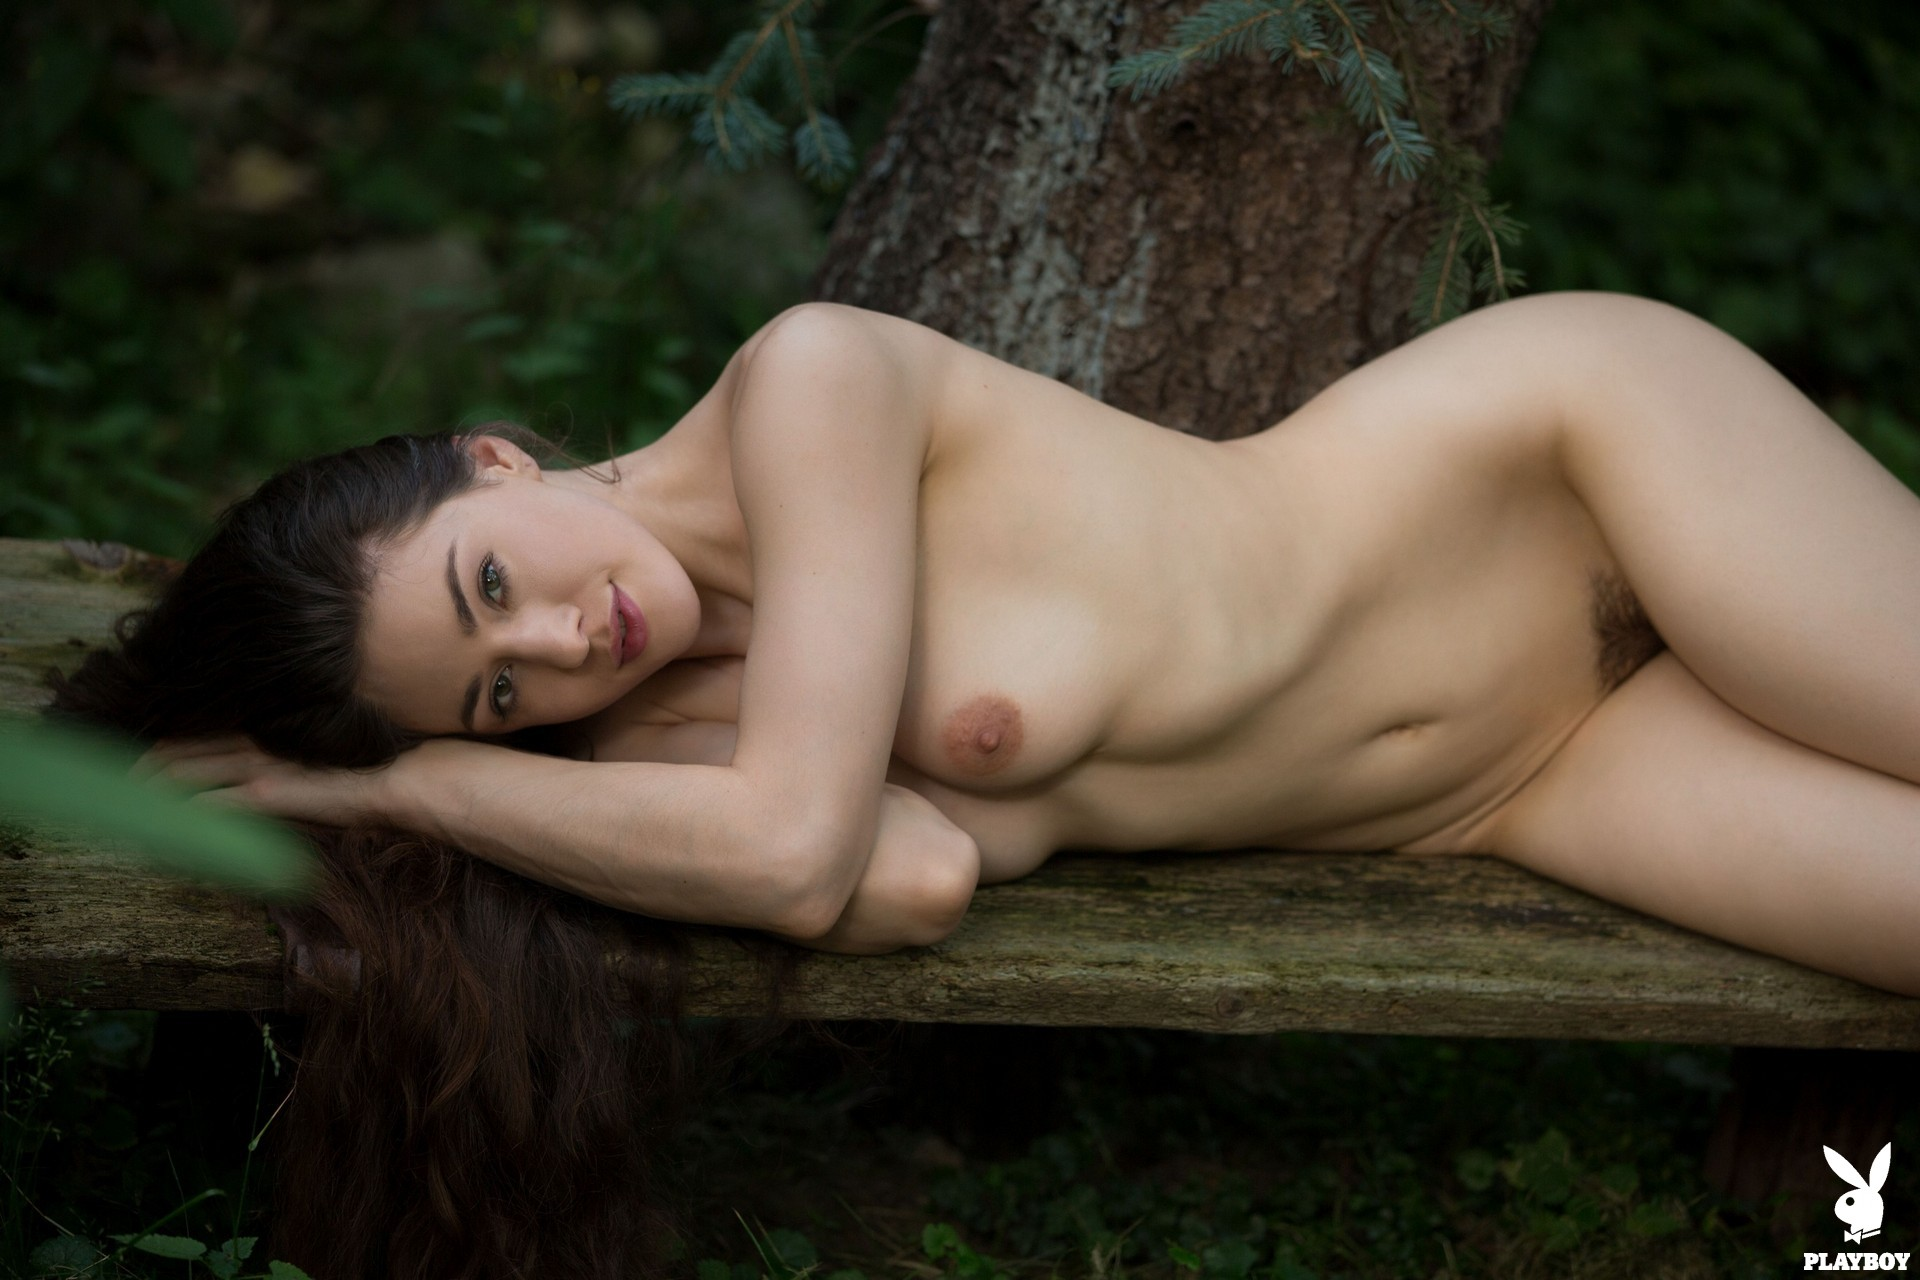 Joy Draiki in Mystic Escape - Playboy Plus 29